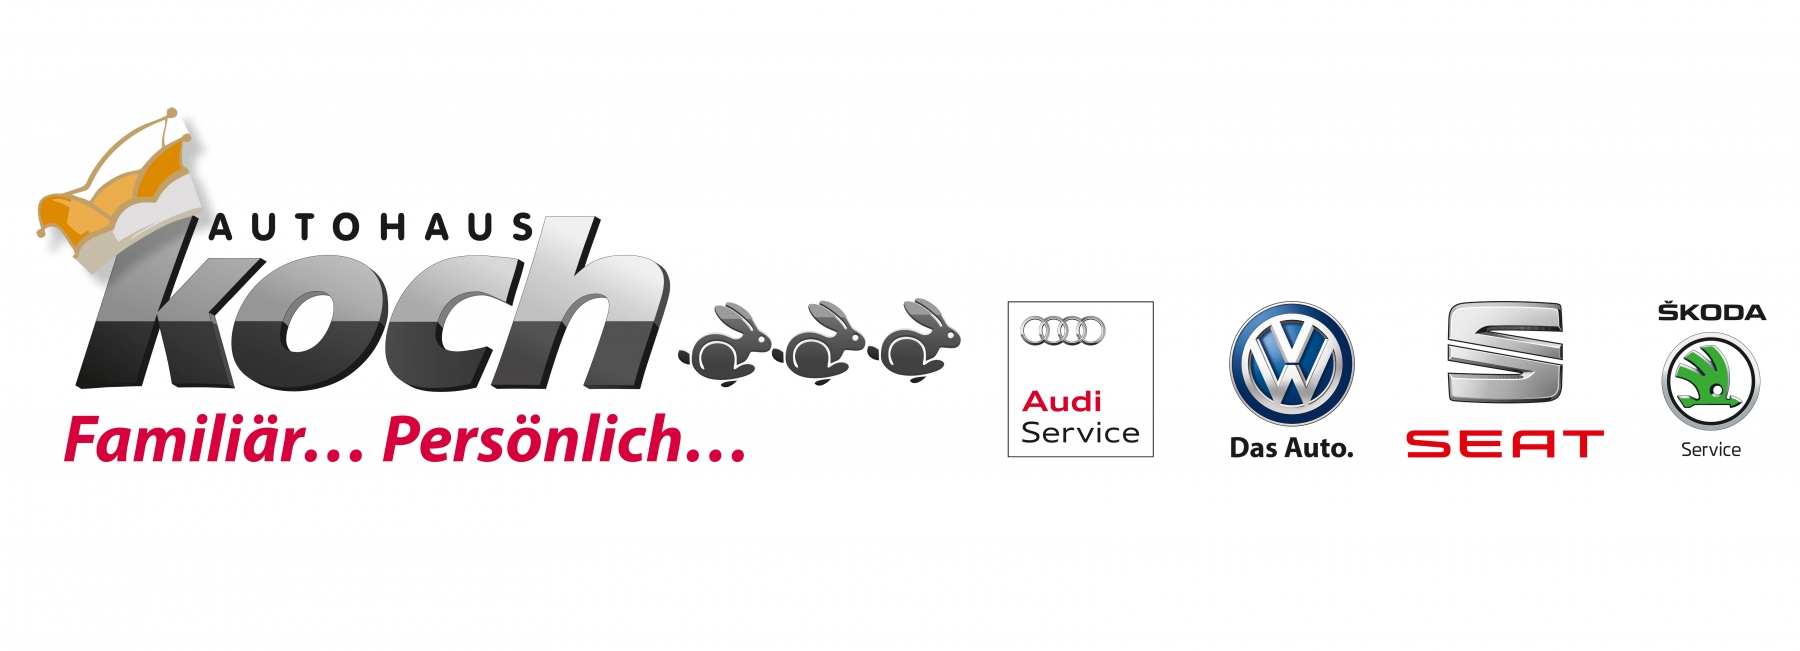 021_Autohaus-Koch